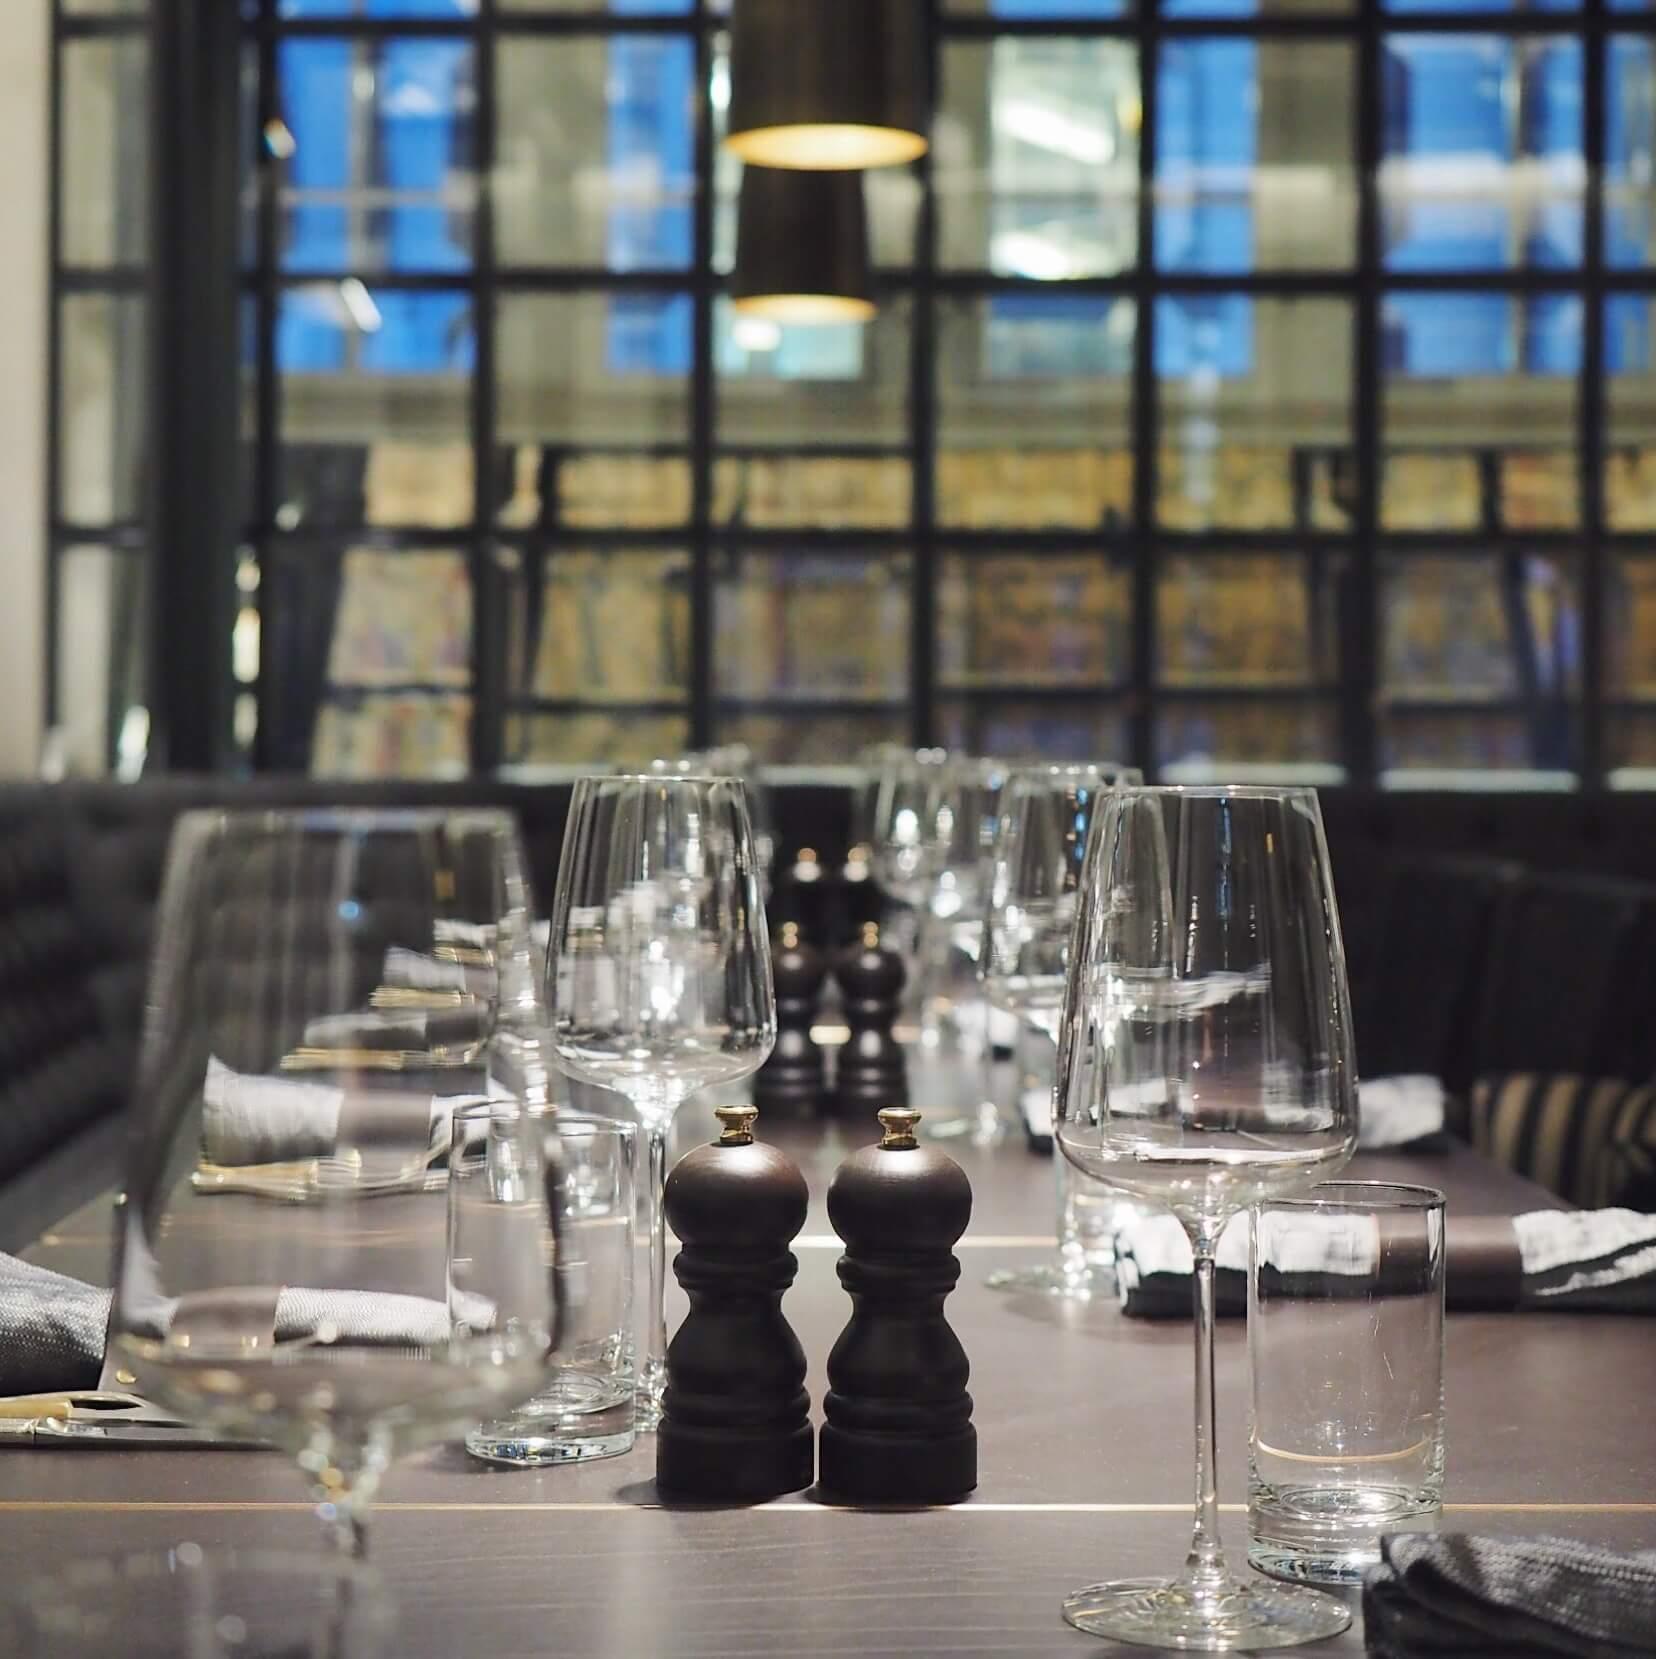 Best Of Bar and Kitchen Home Design Ideas : Widder Bar and Kitchen Zuerich from www.joenboutlet.us size 1656 x 1659 jpeg 170kB